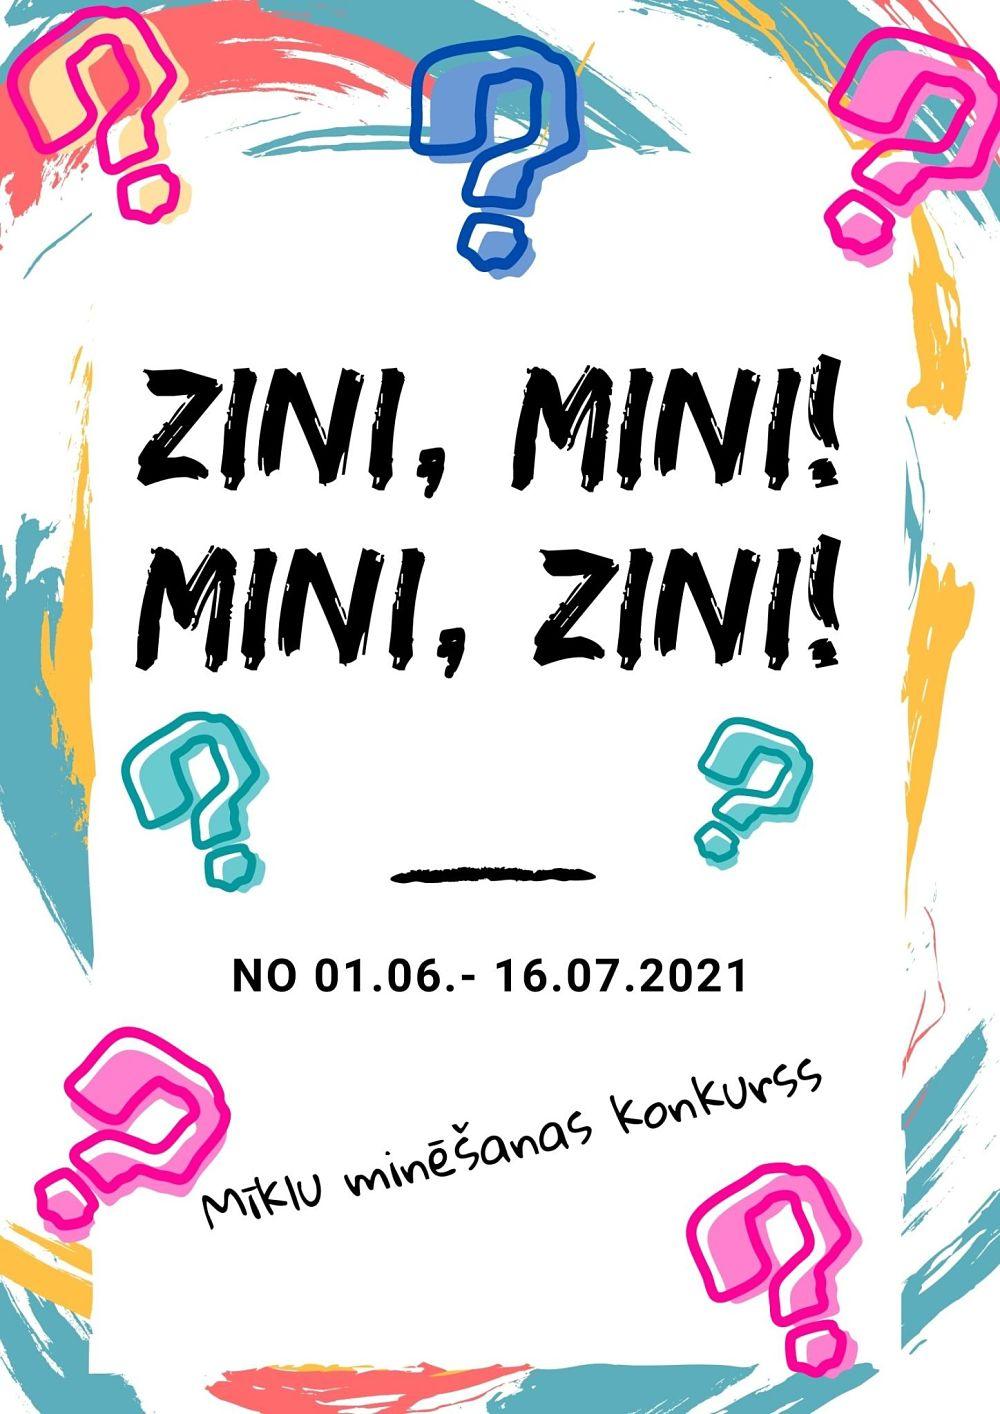 Plakāts konkursam Zini, mini! Mini, zini!